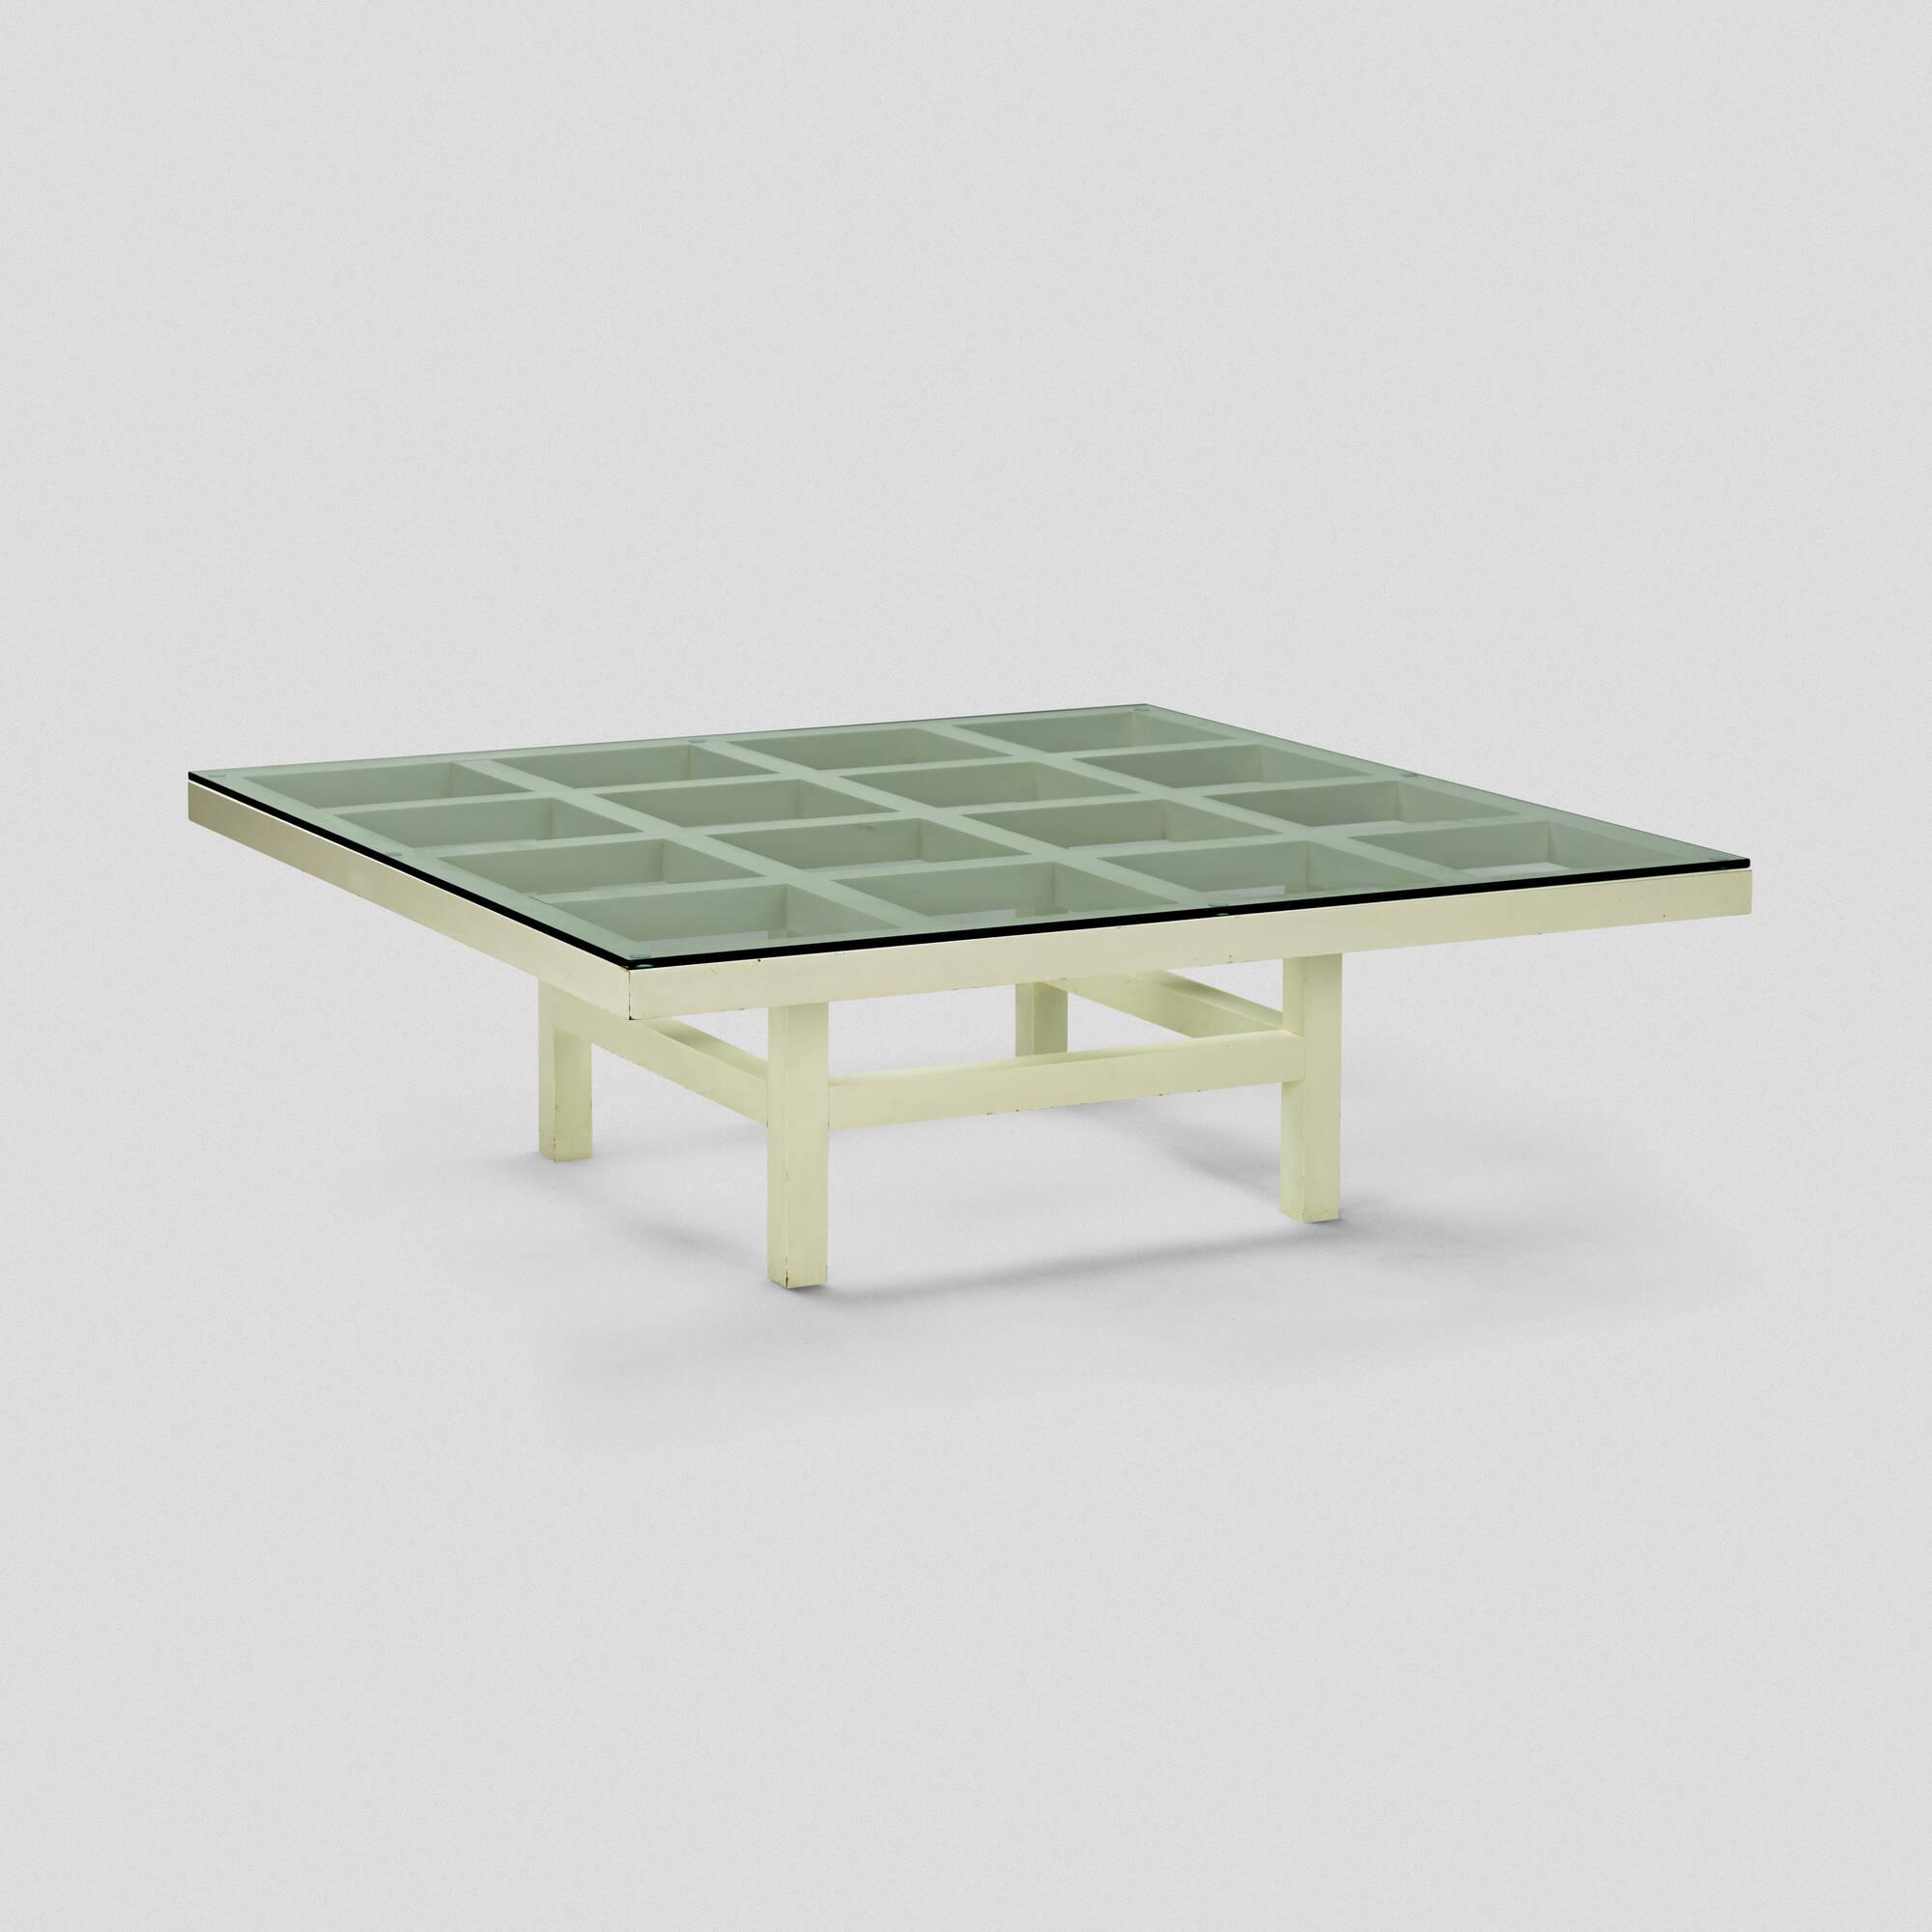 100 Sol LeWitt coffee table Design 26 October 2017